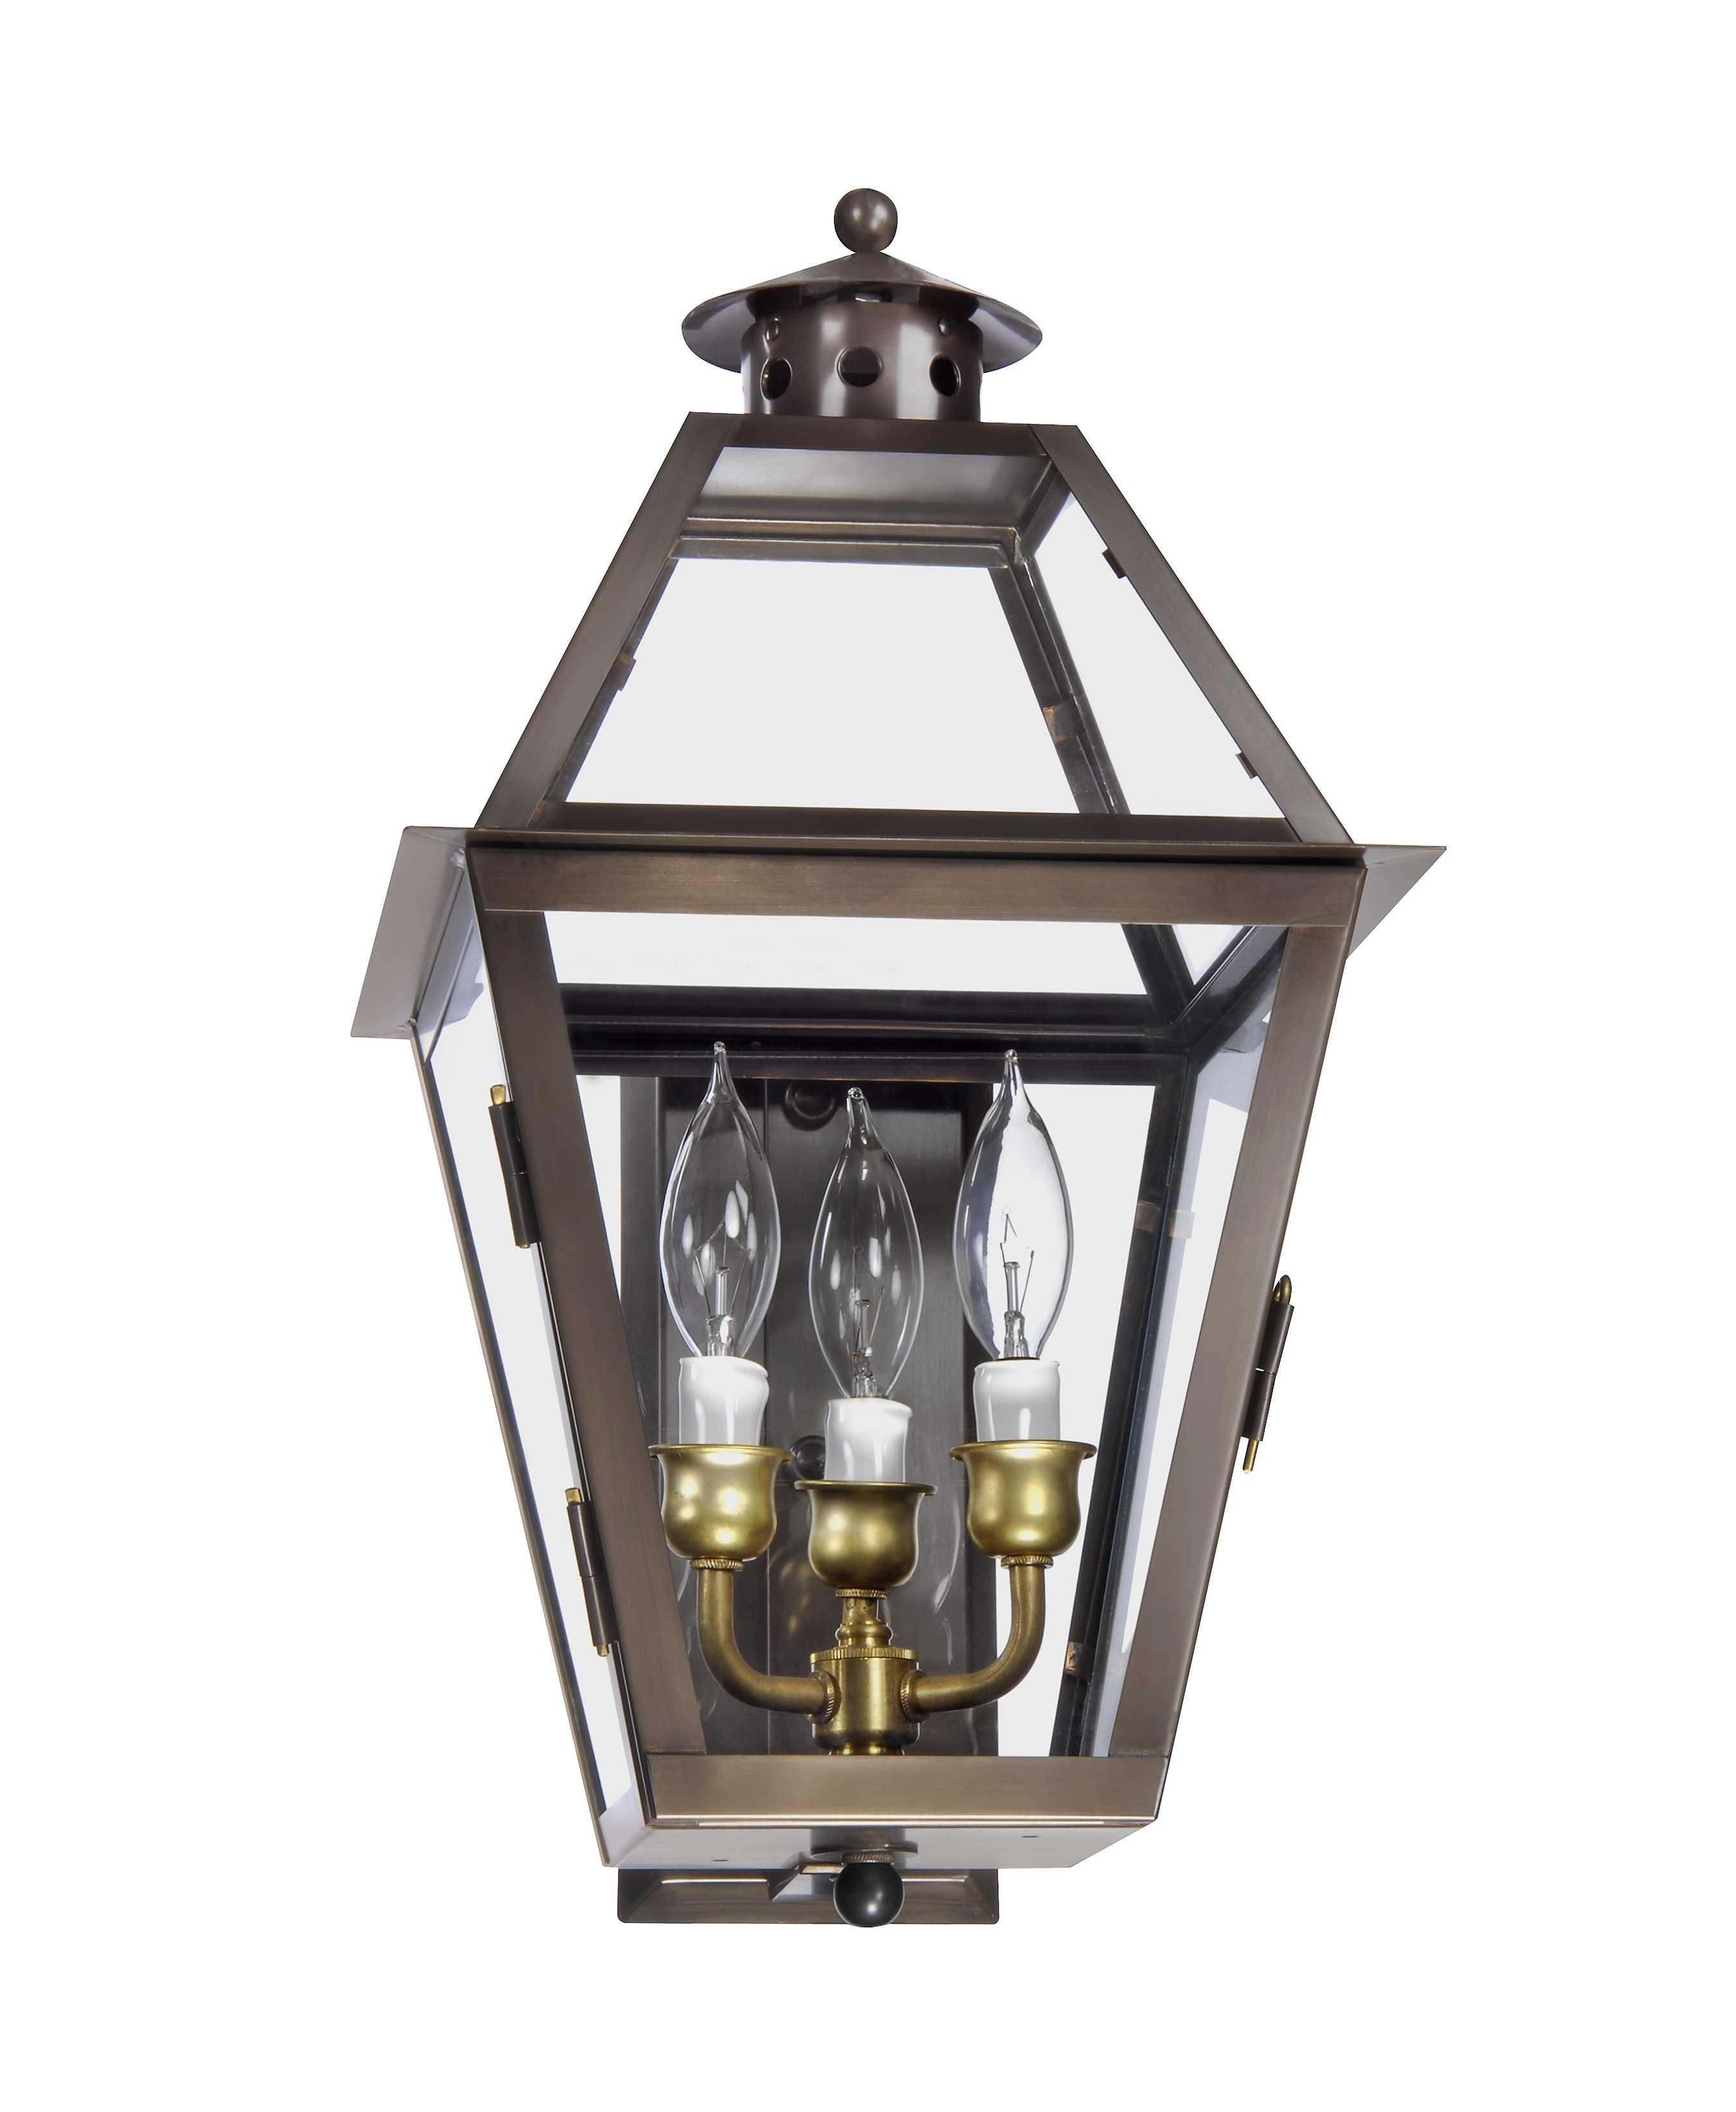 Charleston Collection | Ch 27 Wall Mount Gas Lantern – Lantern & Scroll Regarding Outdoor Electric Lanterns (View 4 of 20)